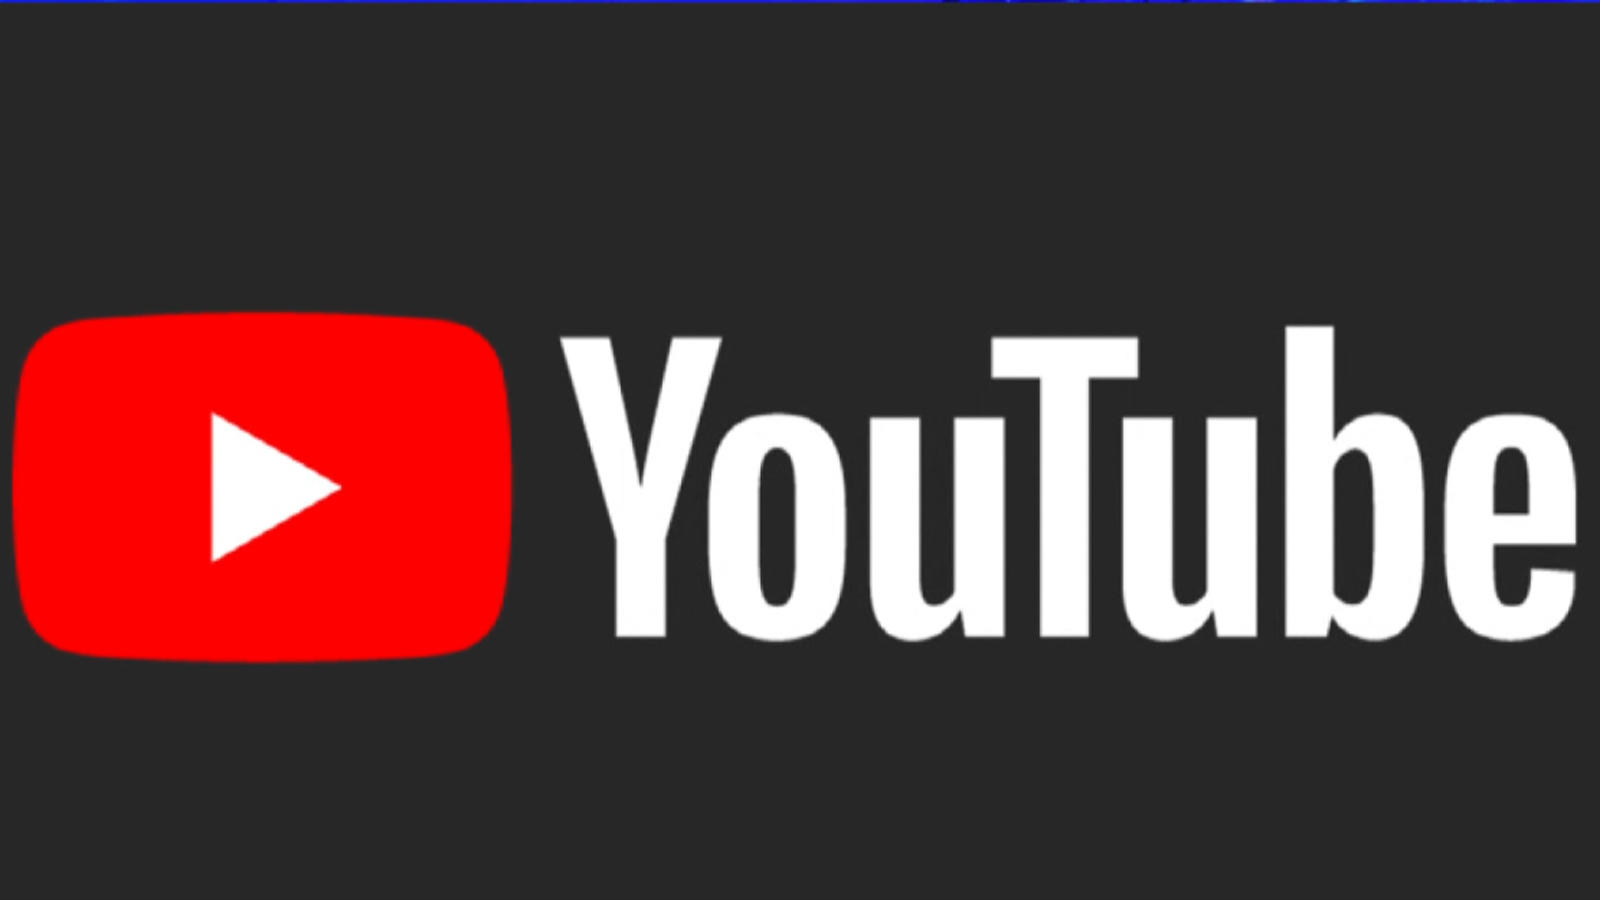 youtube-originals-free-to-watch-starting-next-month